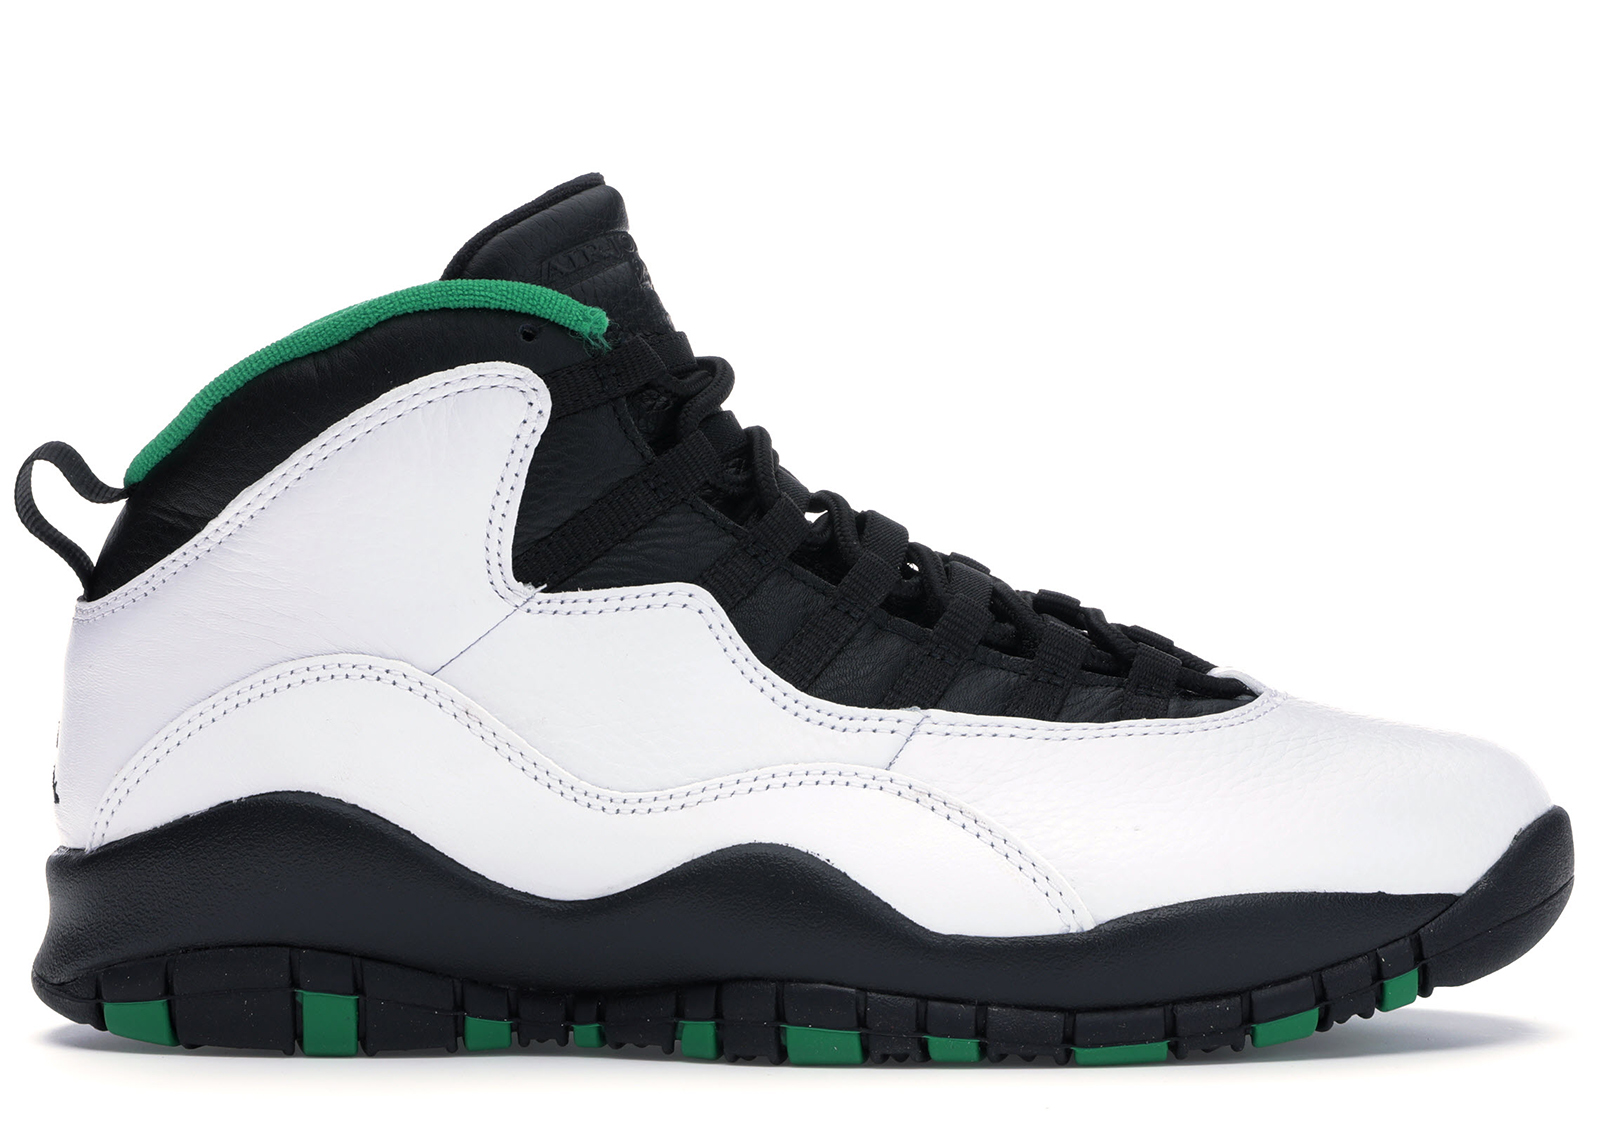 Jordan 10 Retro Seattle